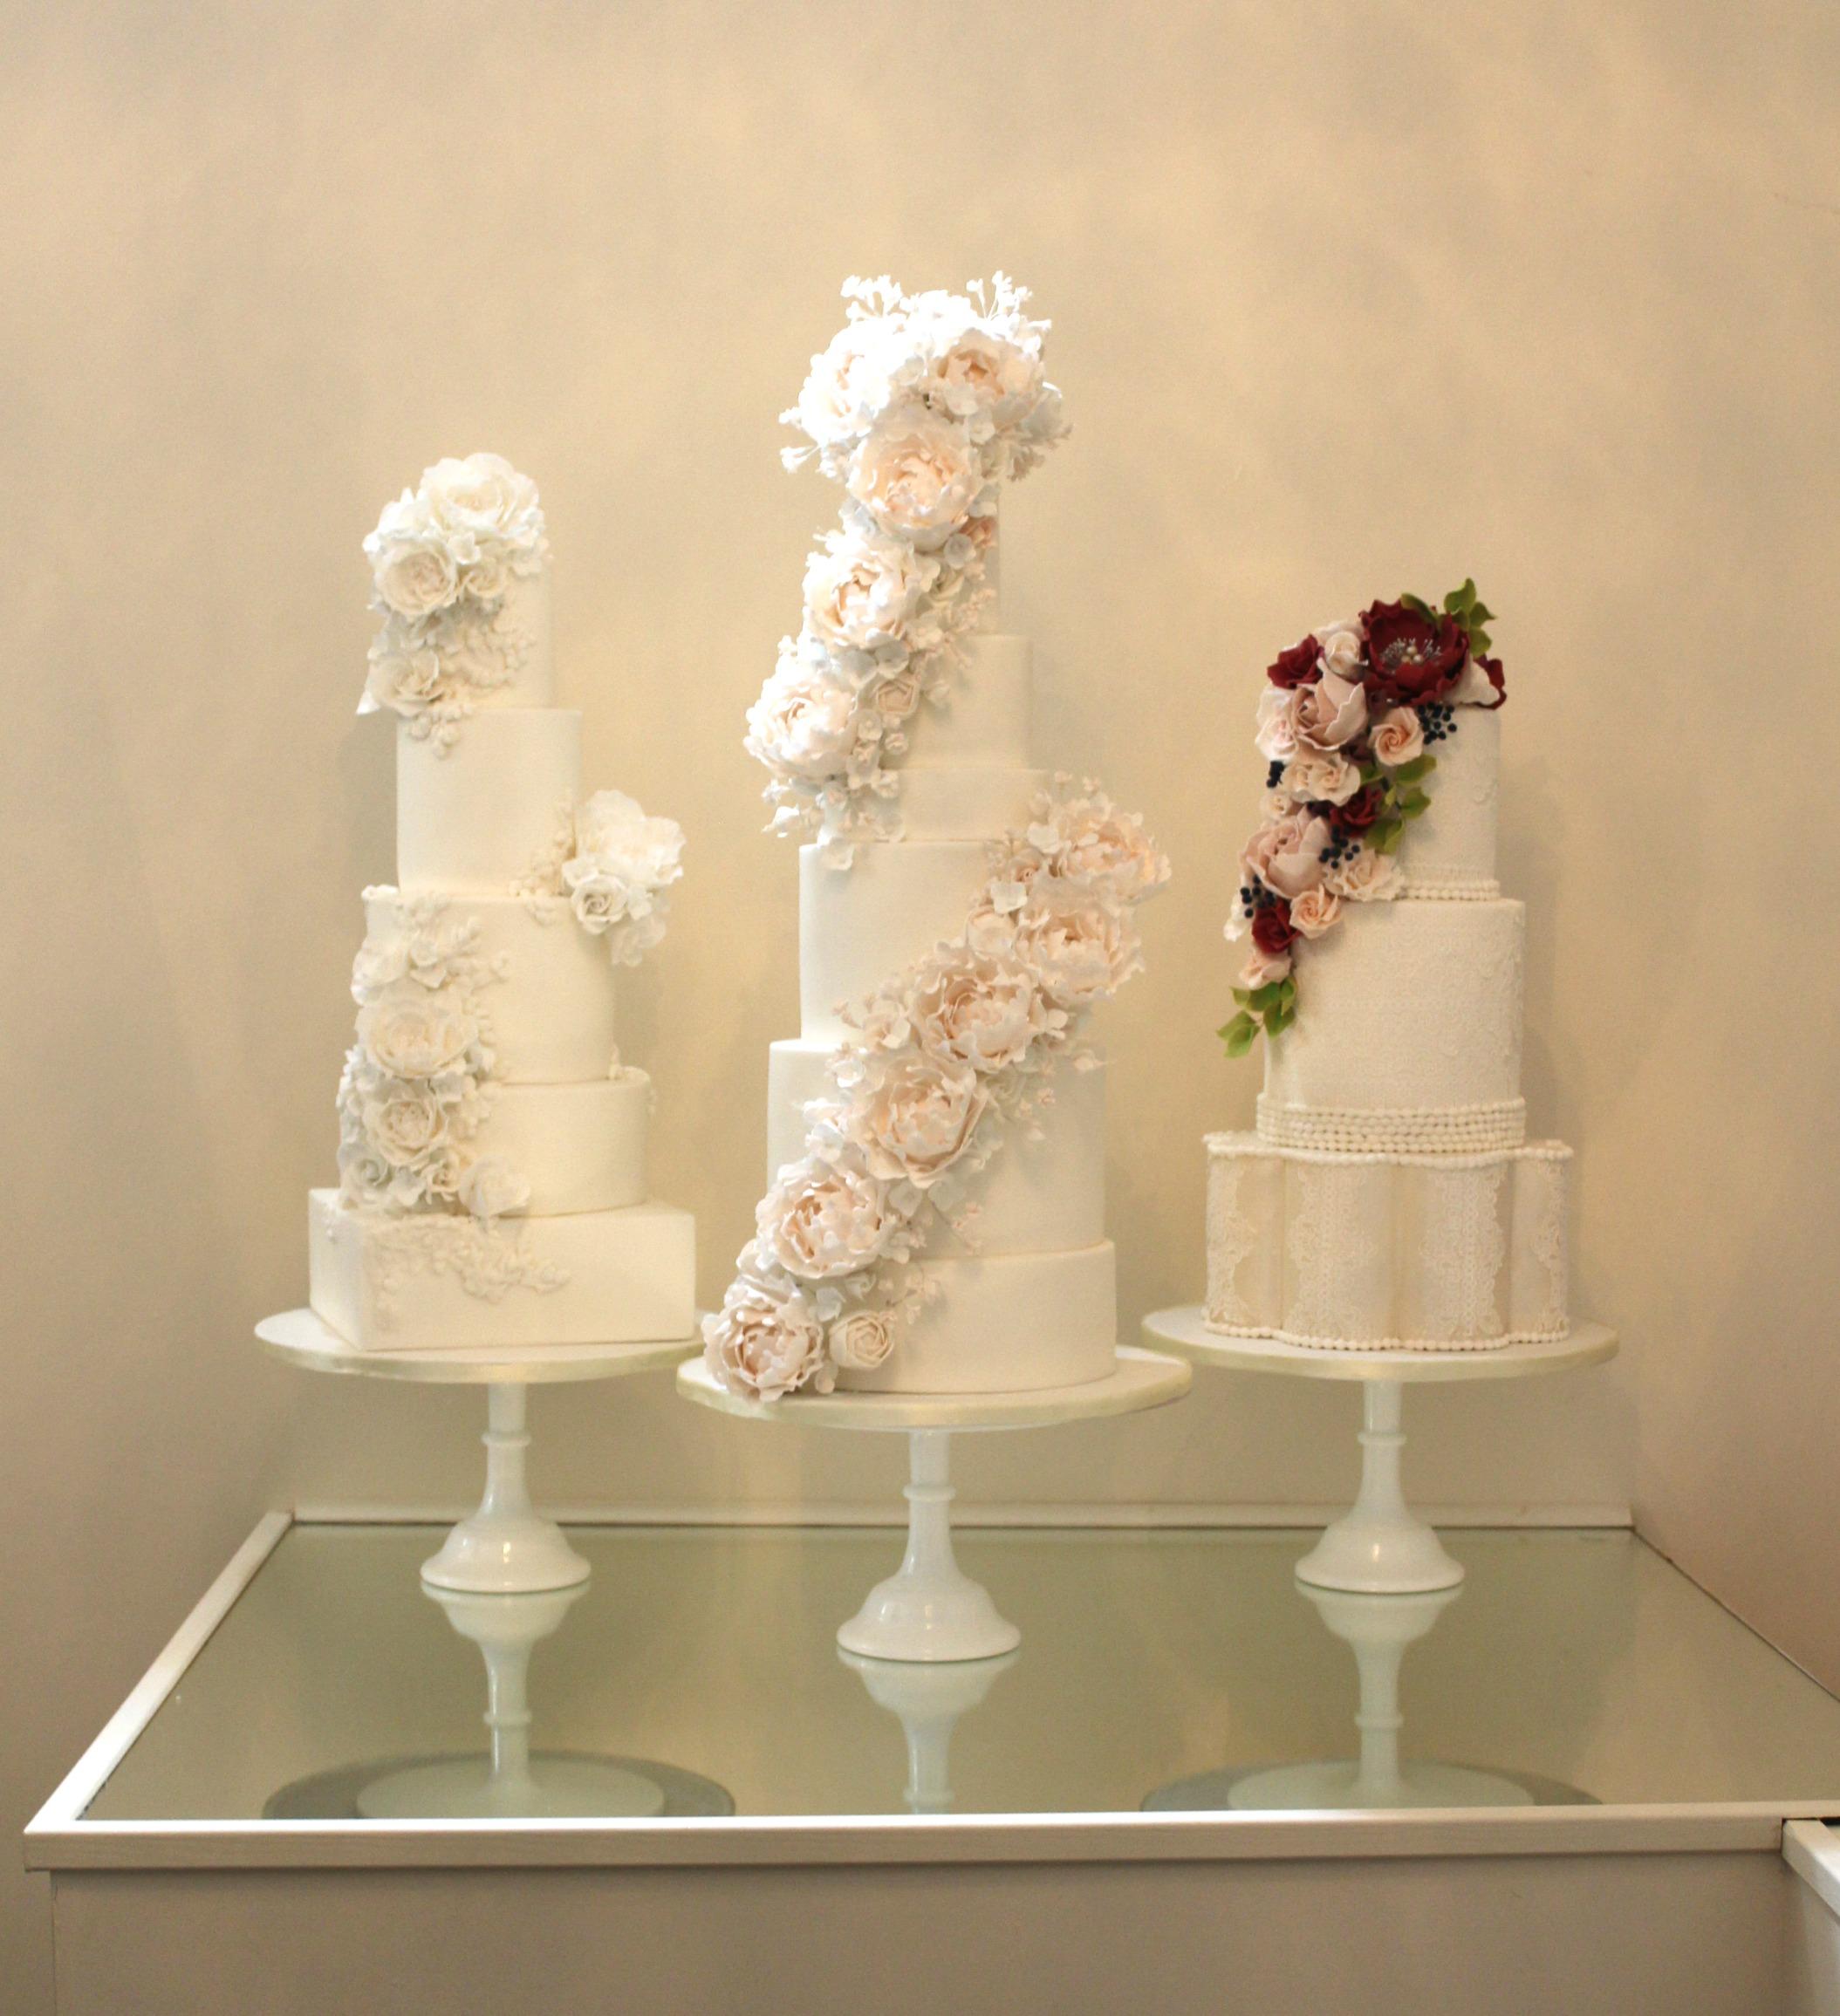 Jordana Events & Bridal Garden - Rosewood Cakes Exceptional Wedding Cakes Glasgow Scotland